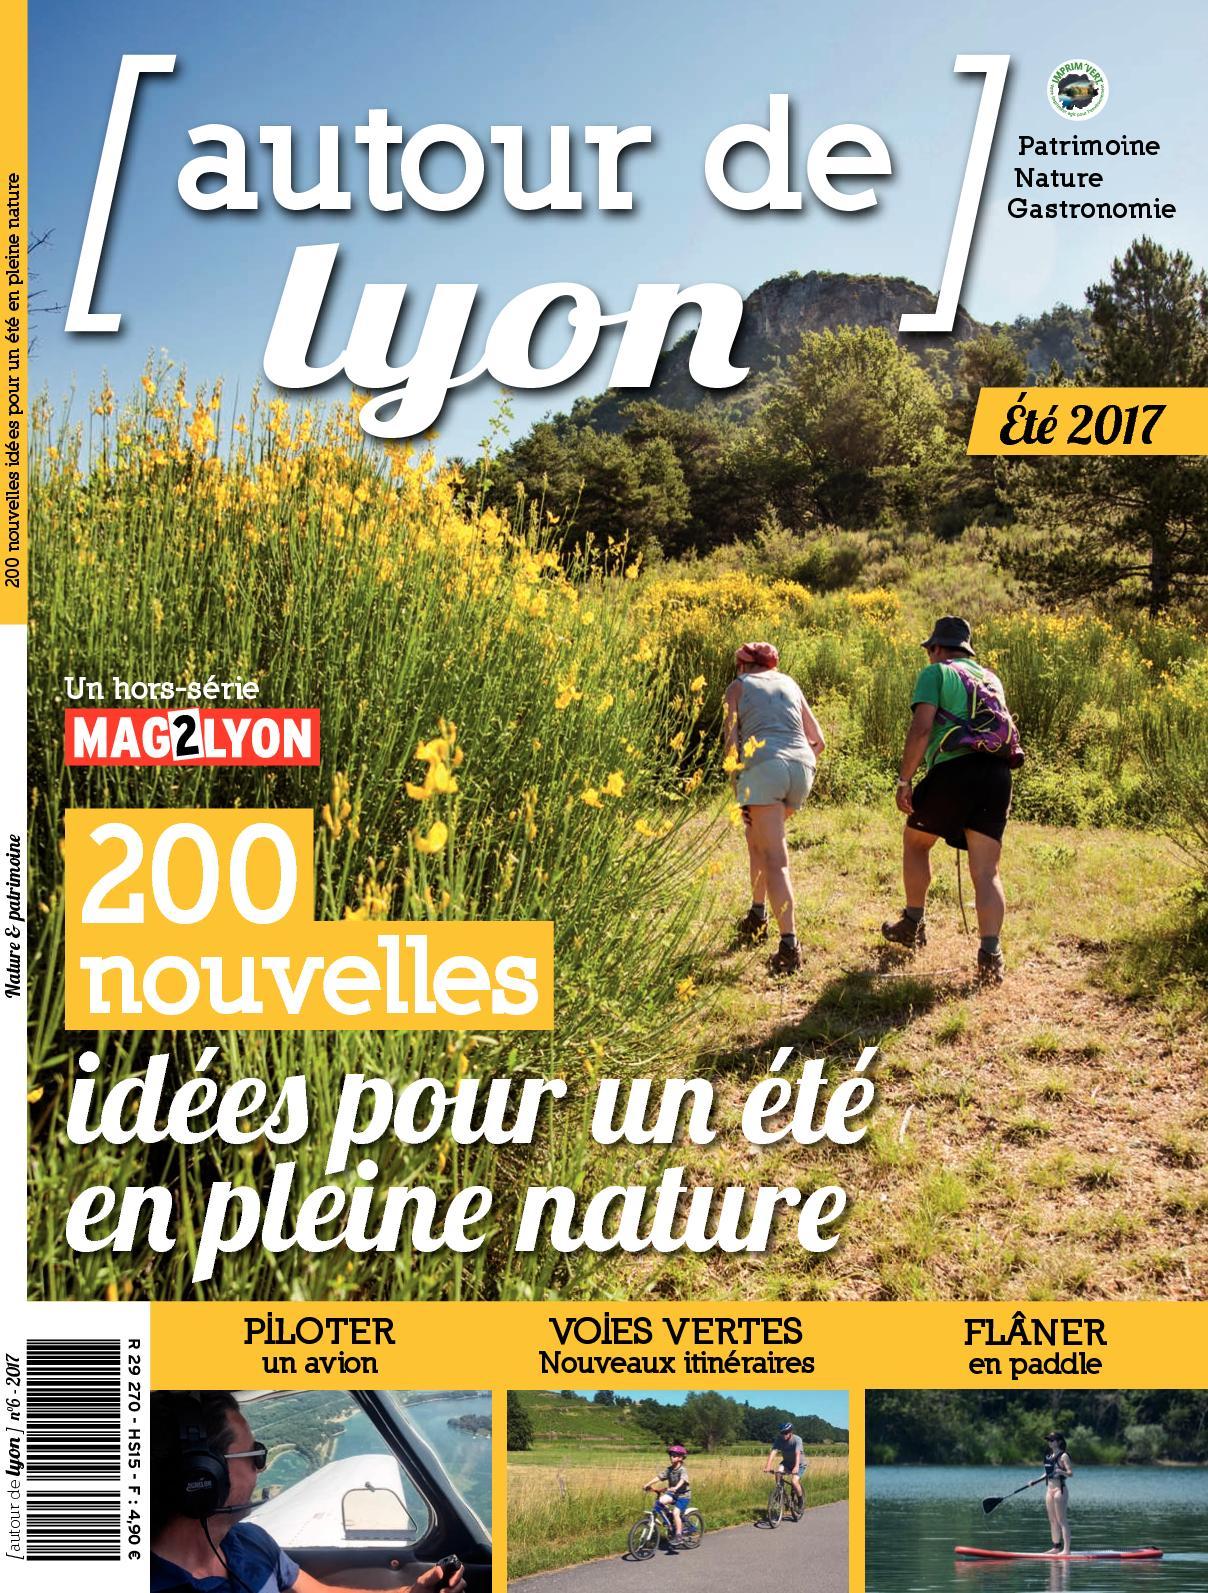 Calaméo - GUIDE AUTOUR DE LYON 2017 (Hors-série MAG2LYON) 4fe4d858e46b